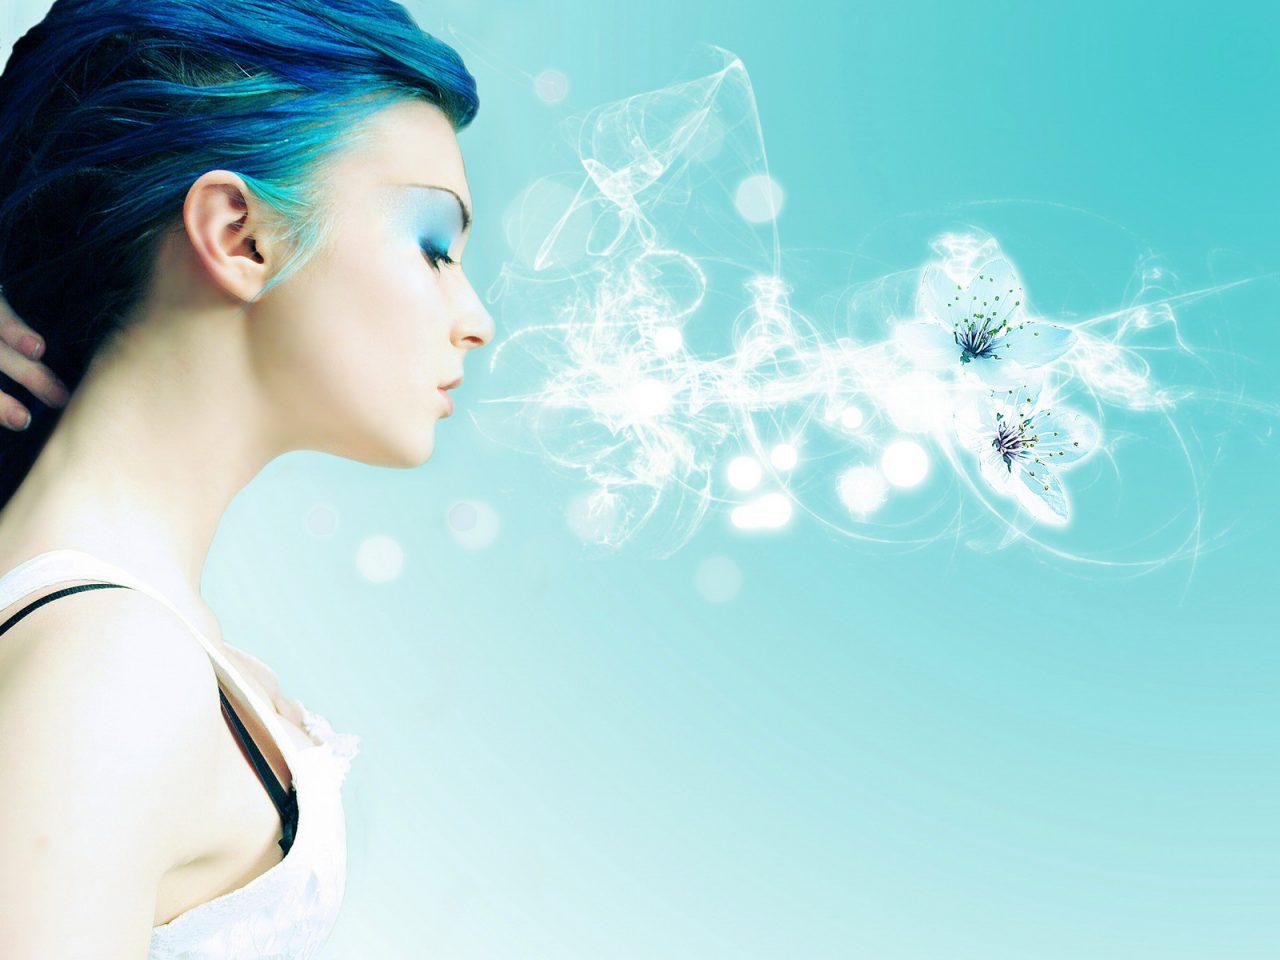 breathe-1-1280x960.jpg